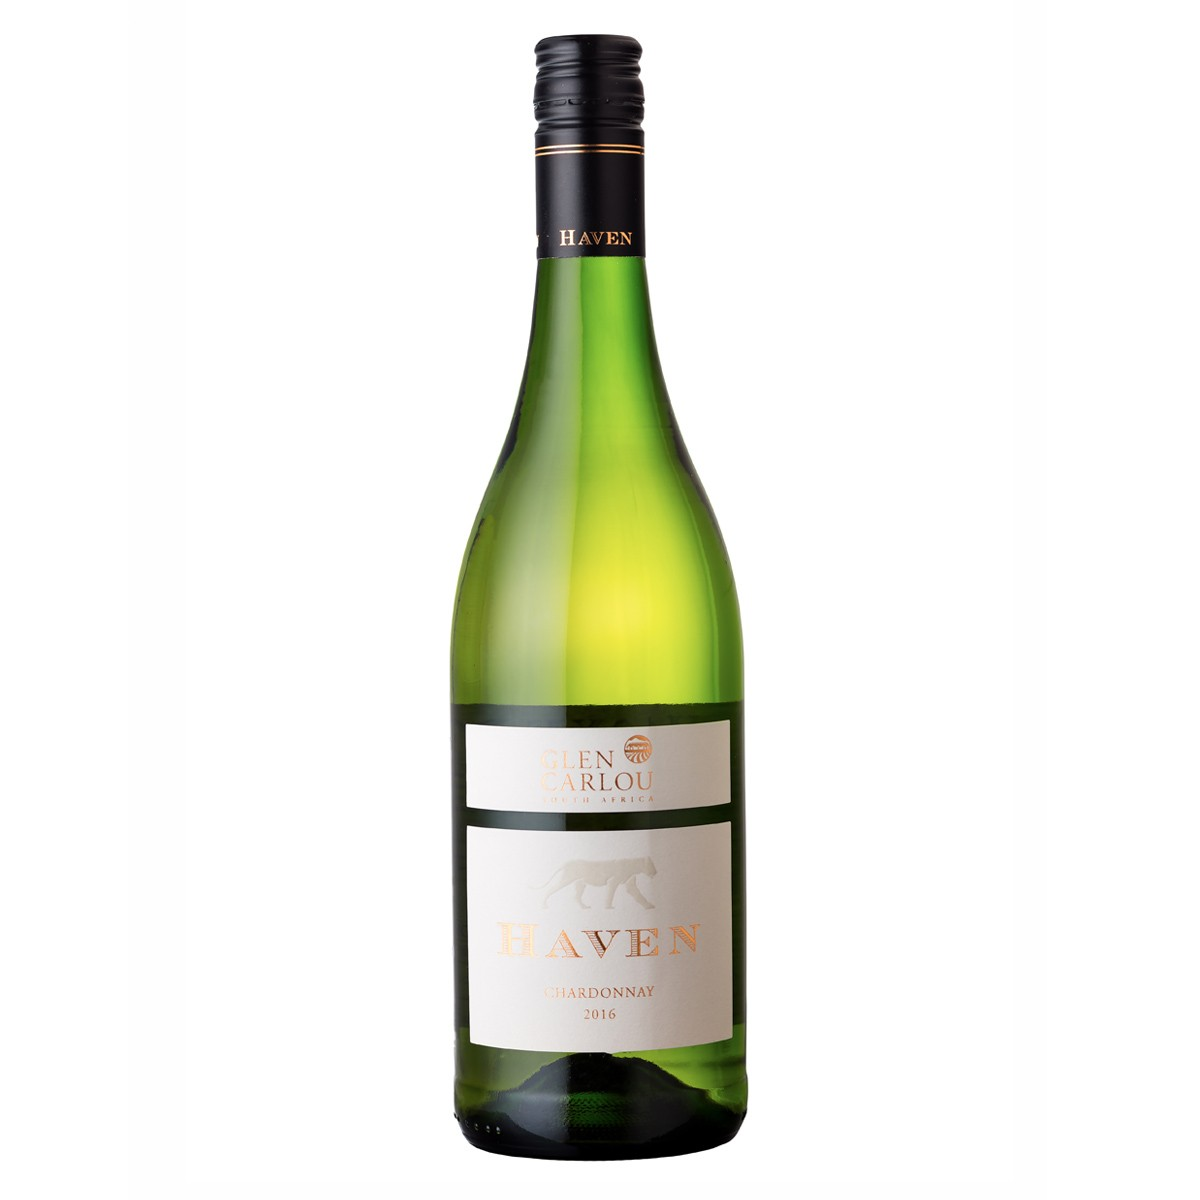 Haven Chardonnay